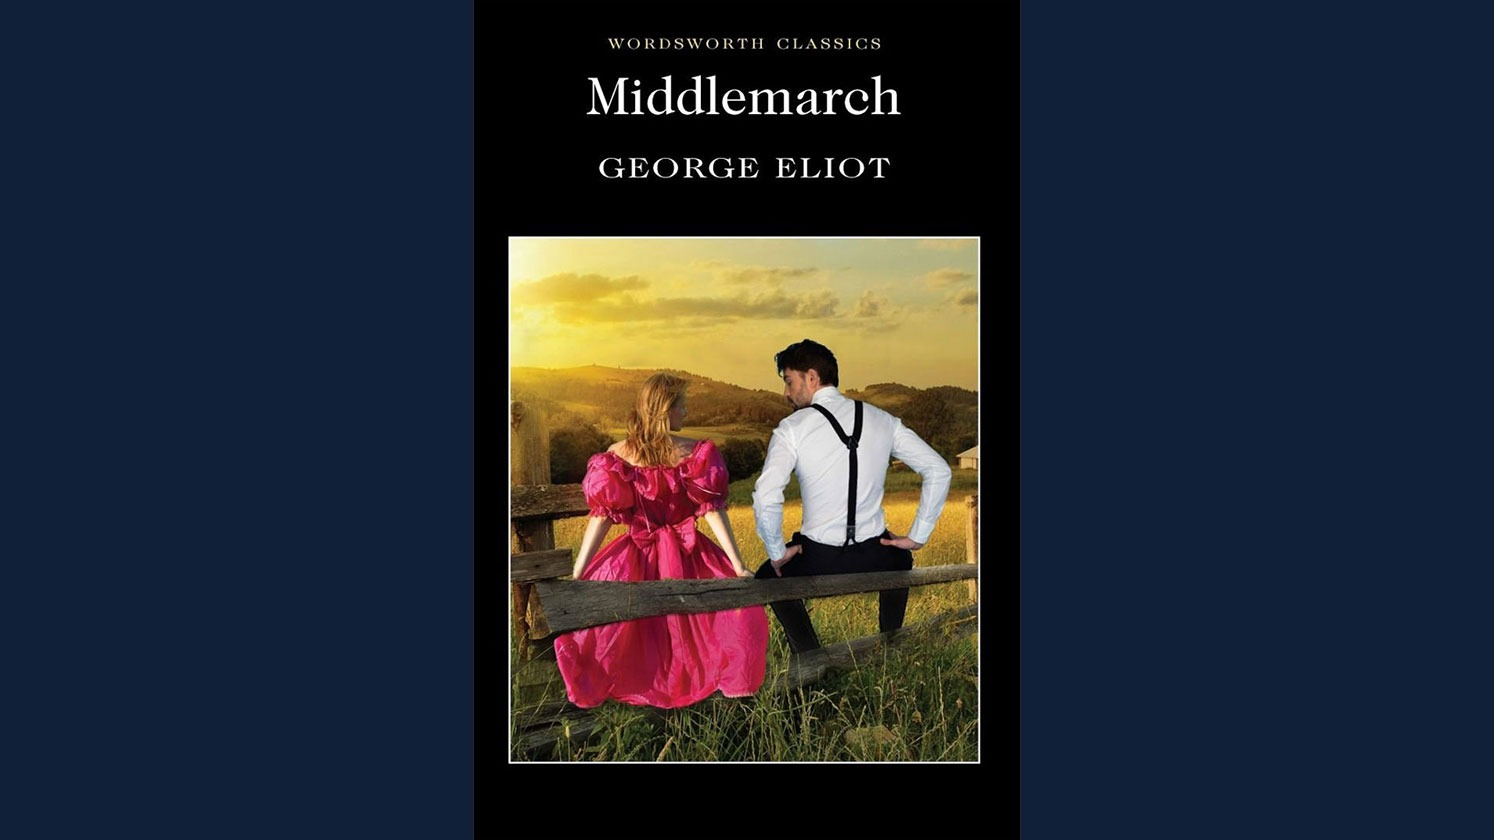 رمان کلاسیک انگلیسی میدل مارچ